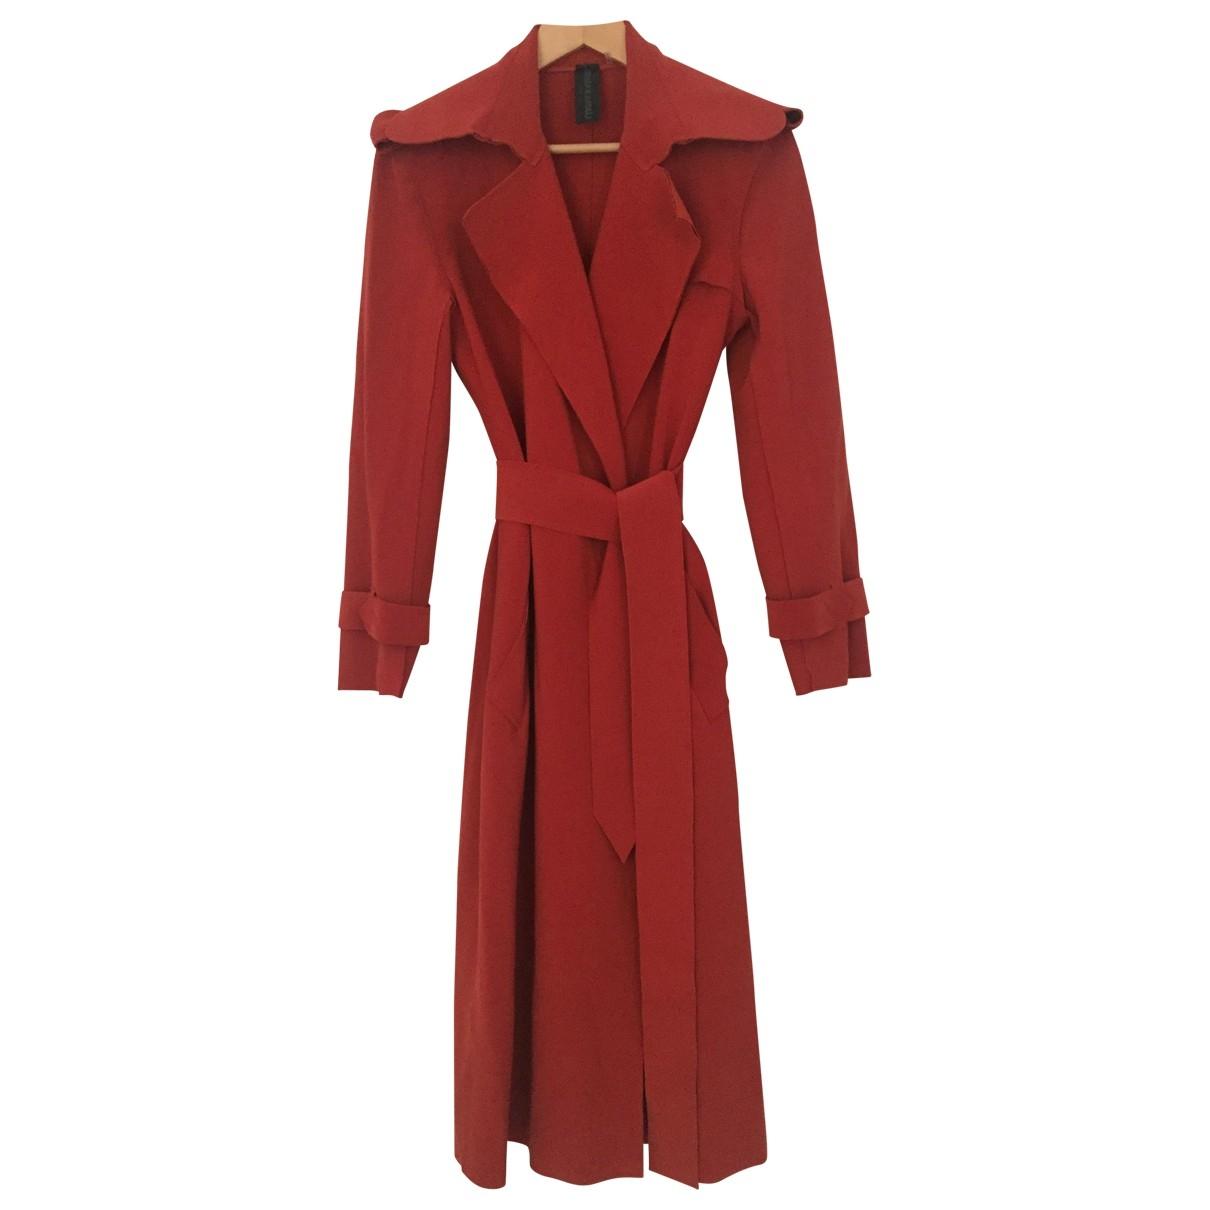 Norma Kamali \N Red Trench coat for Women XS International